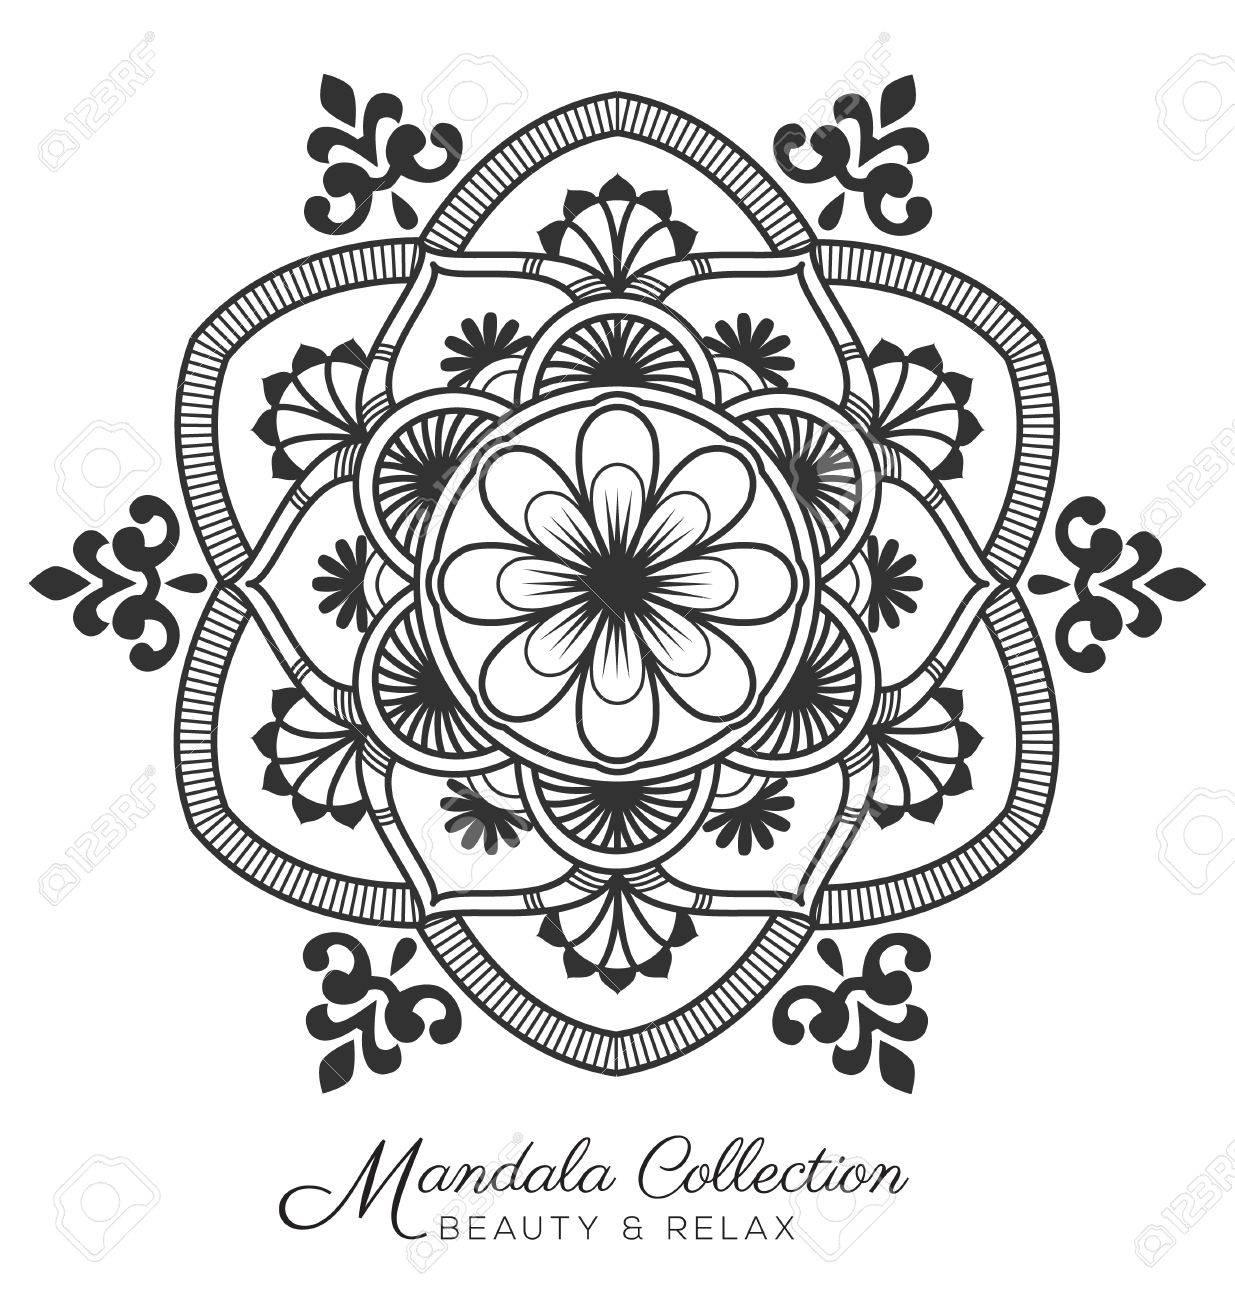 Mandala Diseño De Ornamento Decorativo Tibetano Por Página Para ...